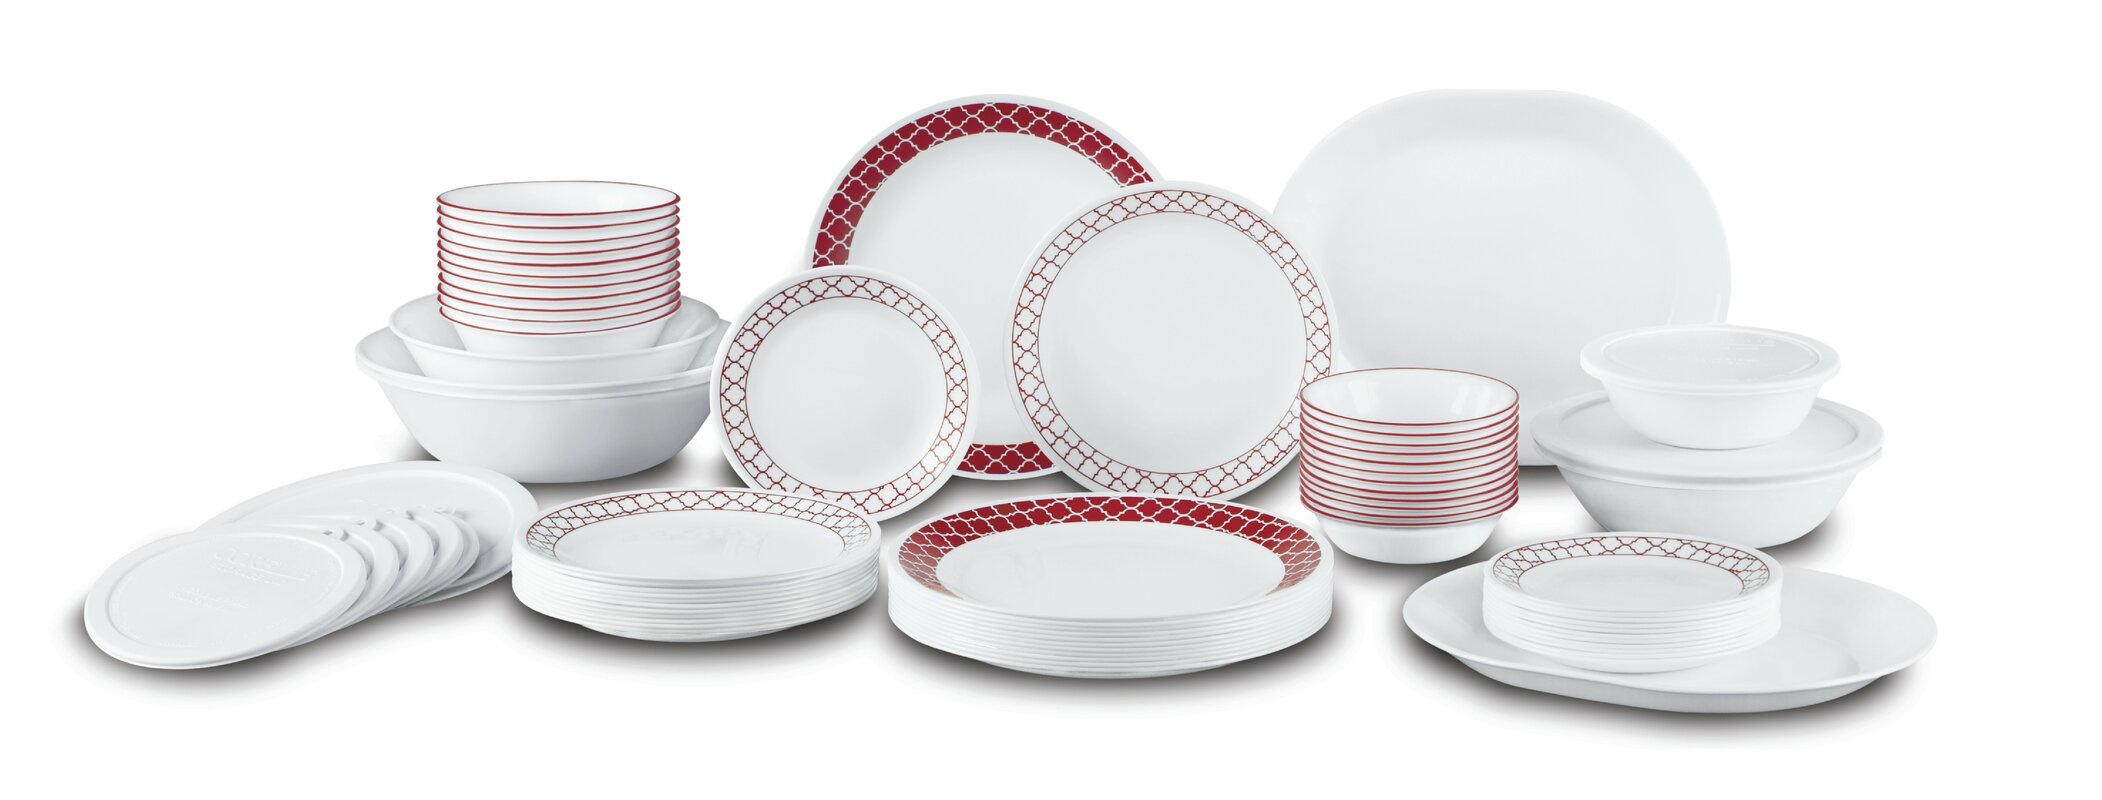 Crimson Trellis Living Ware 74 Piece Dinnerware Set Service for 12  sc 1 st  Wayfair & Corelle Dinnerware Sets Youu0027ll Love | Wayfair